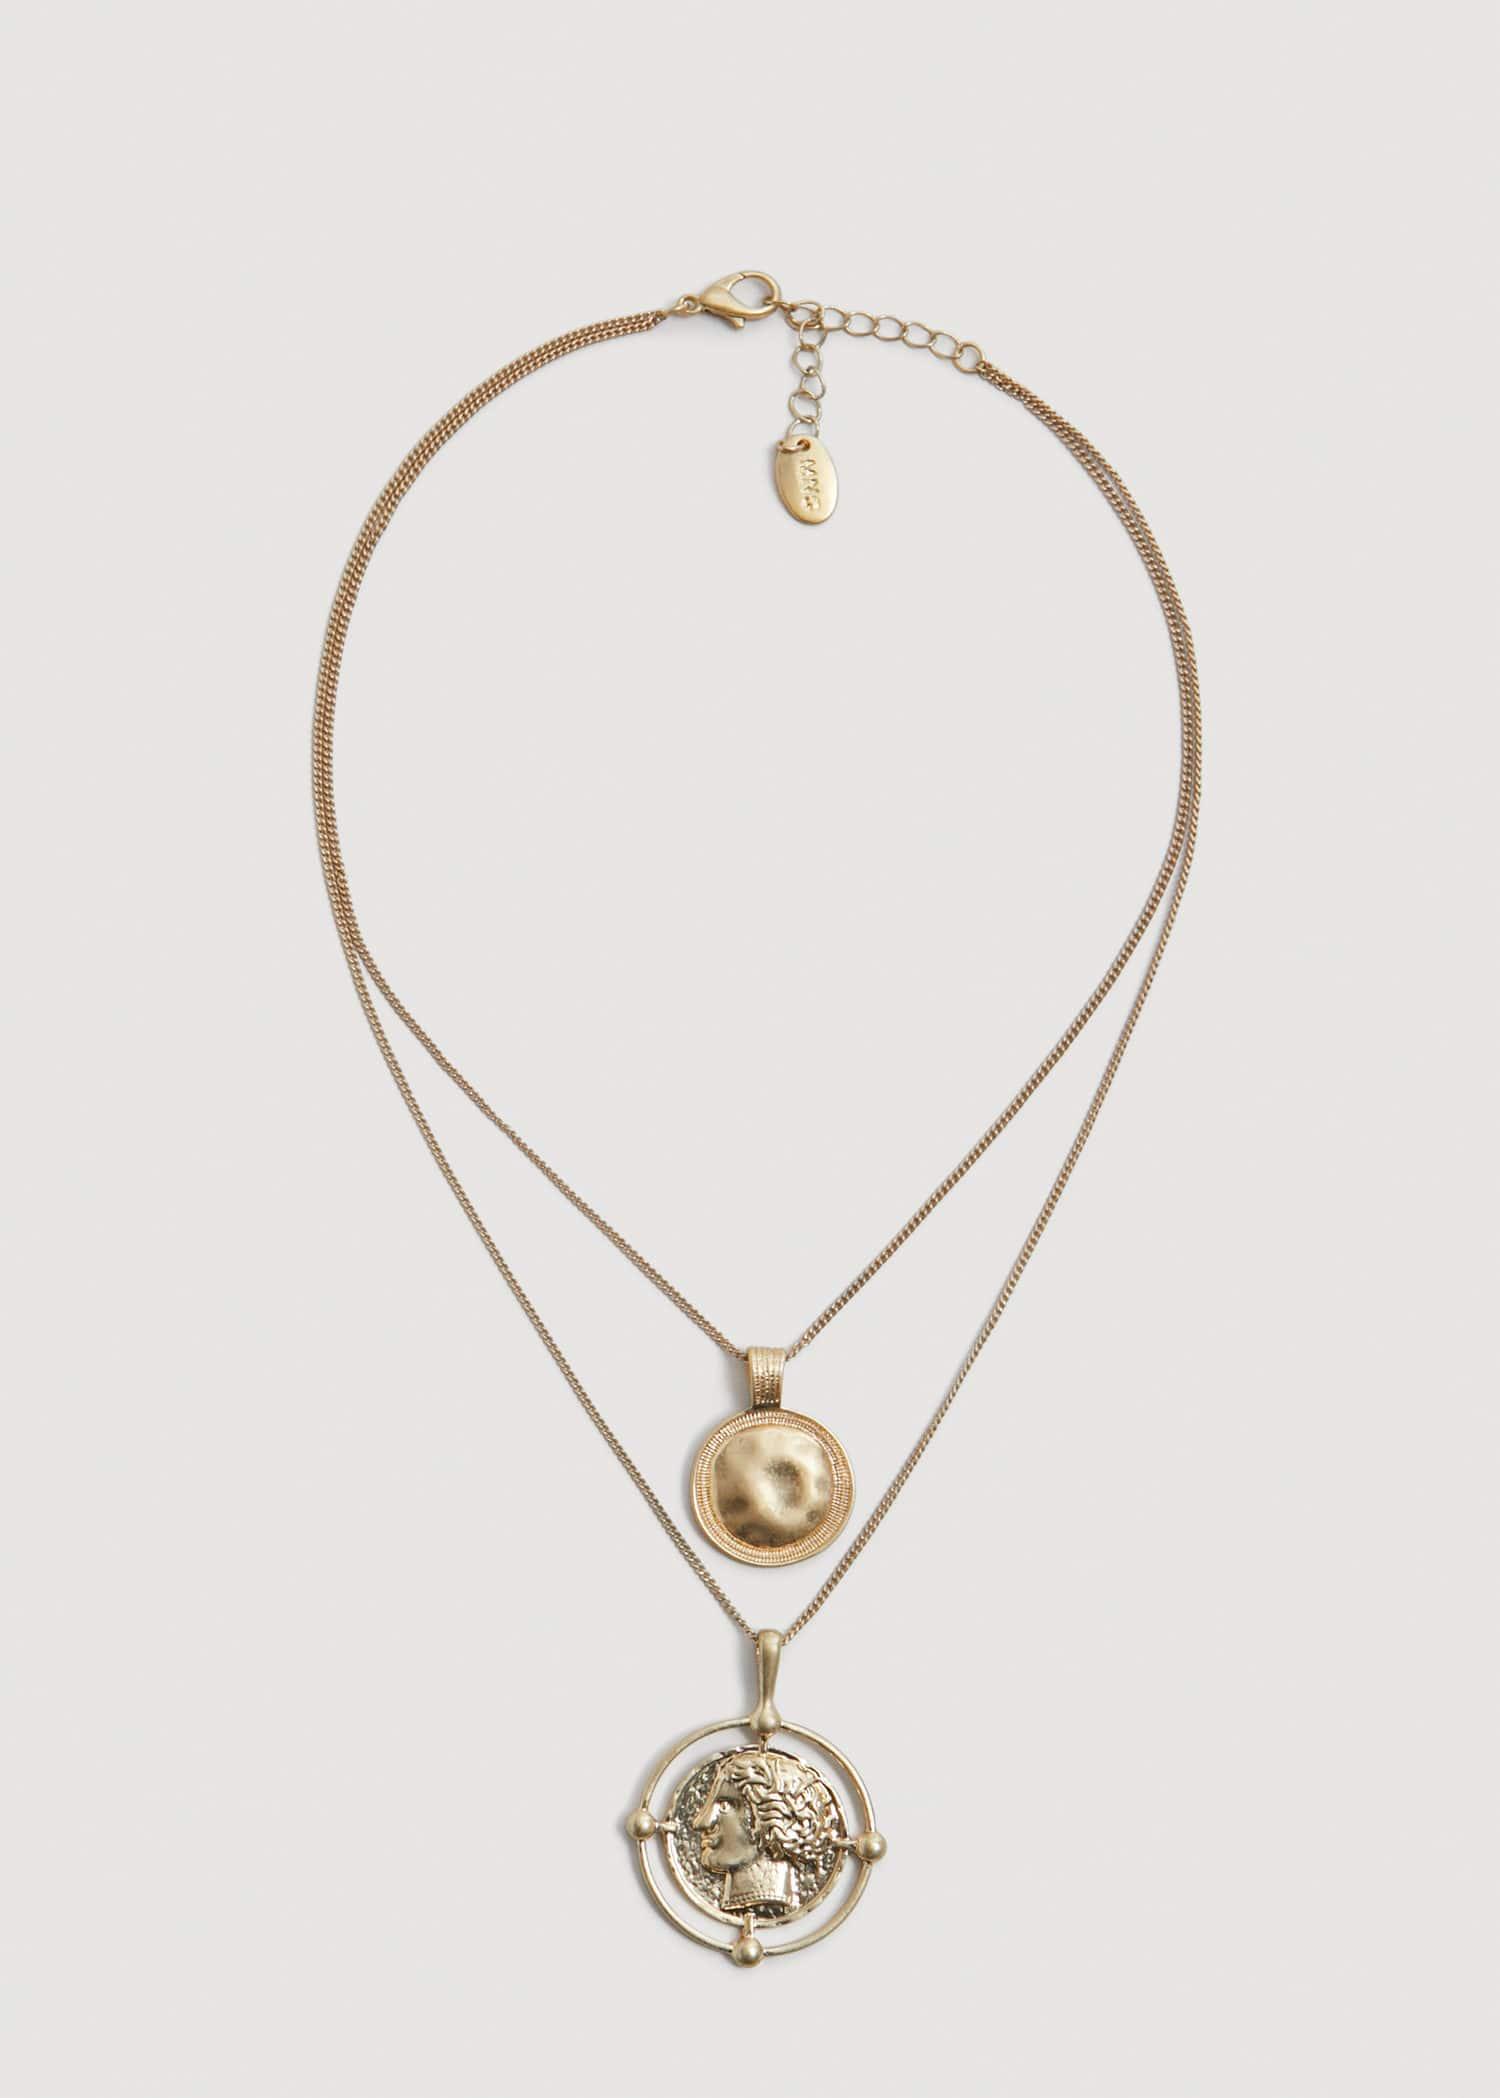 tikli jhumka tikka chaandbaali chandbali Indian pakistani designer bridal multicolor n gold combo earrings and maangtikka